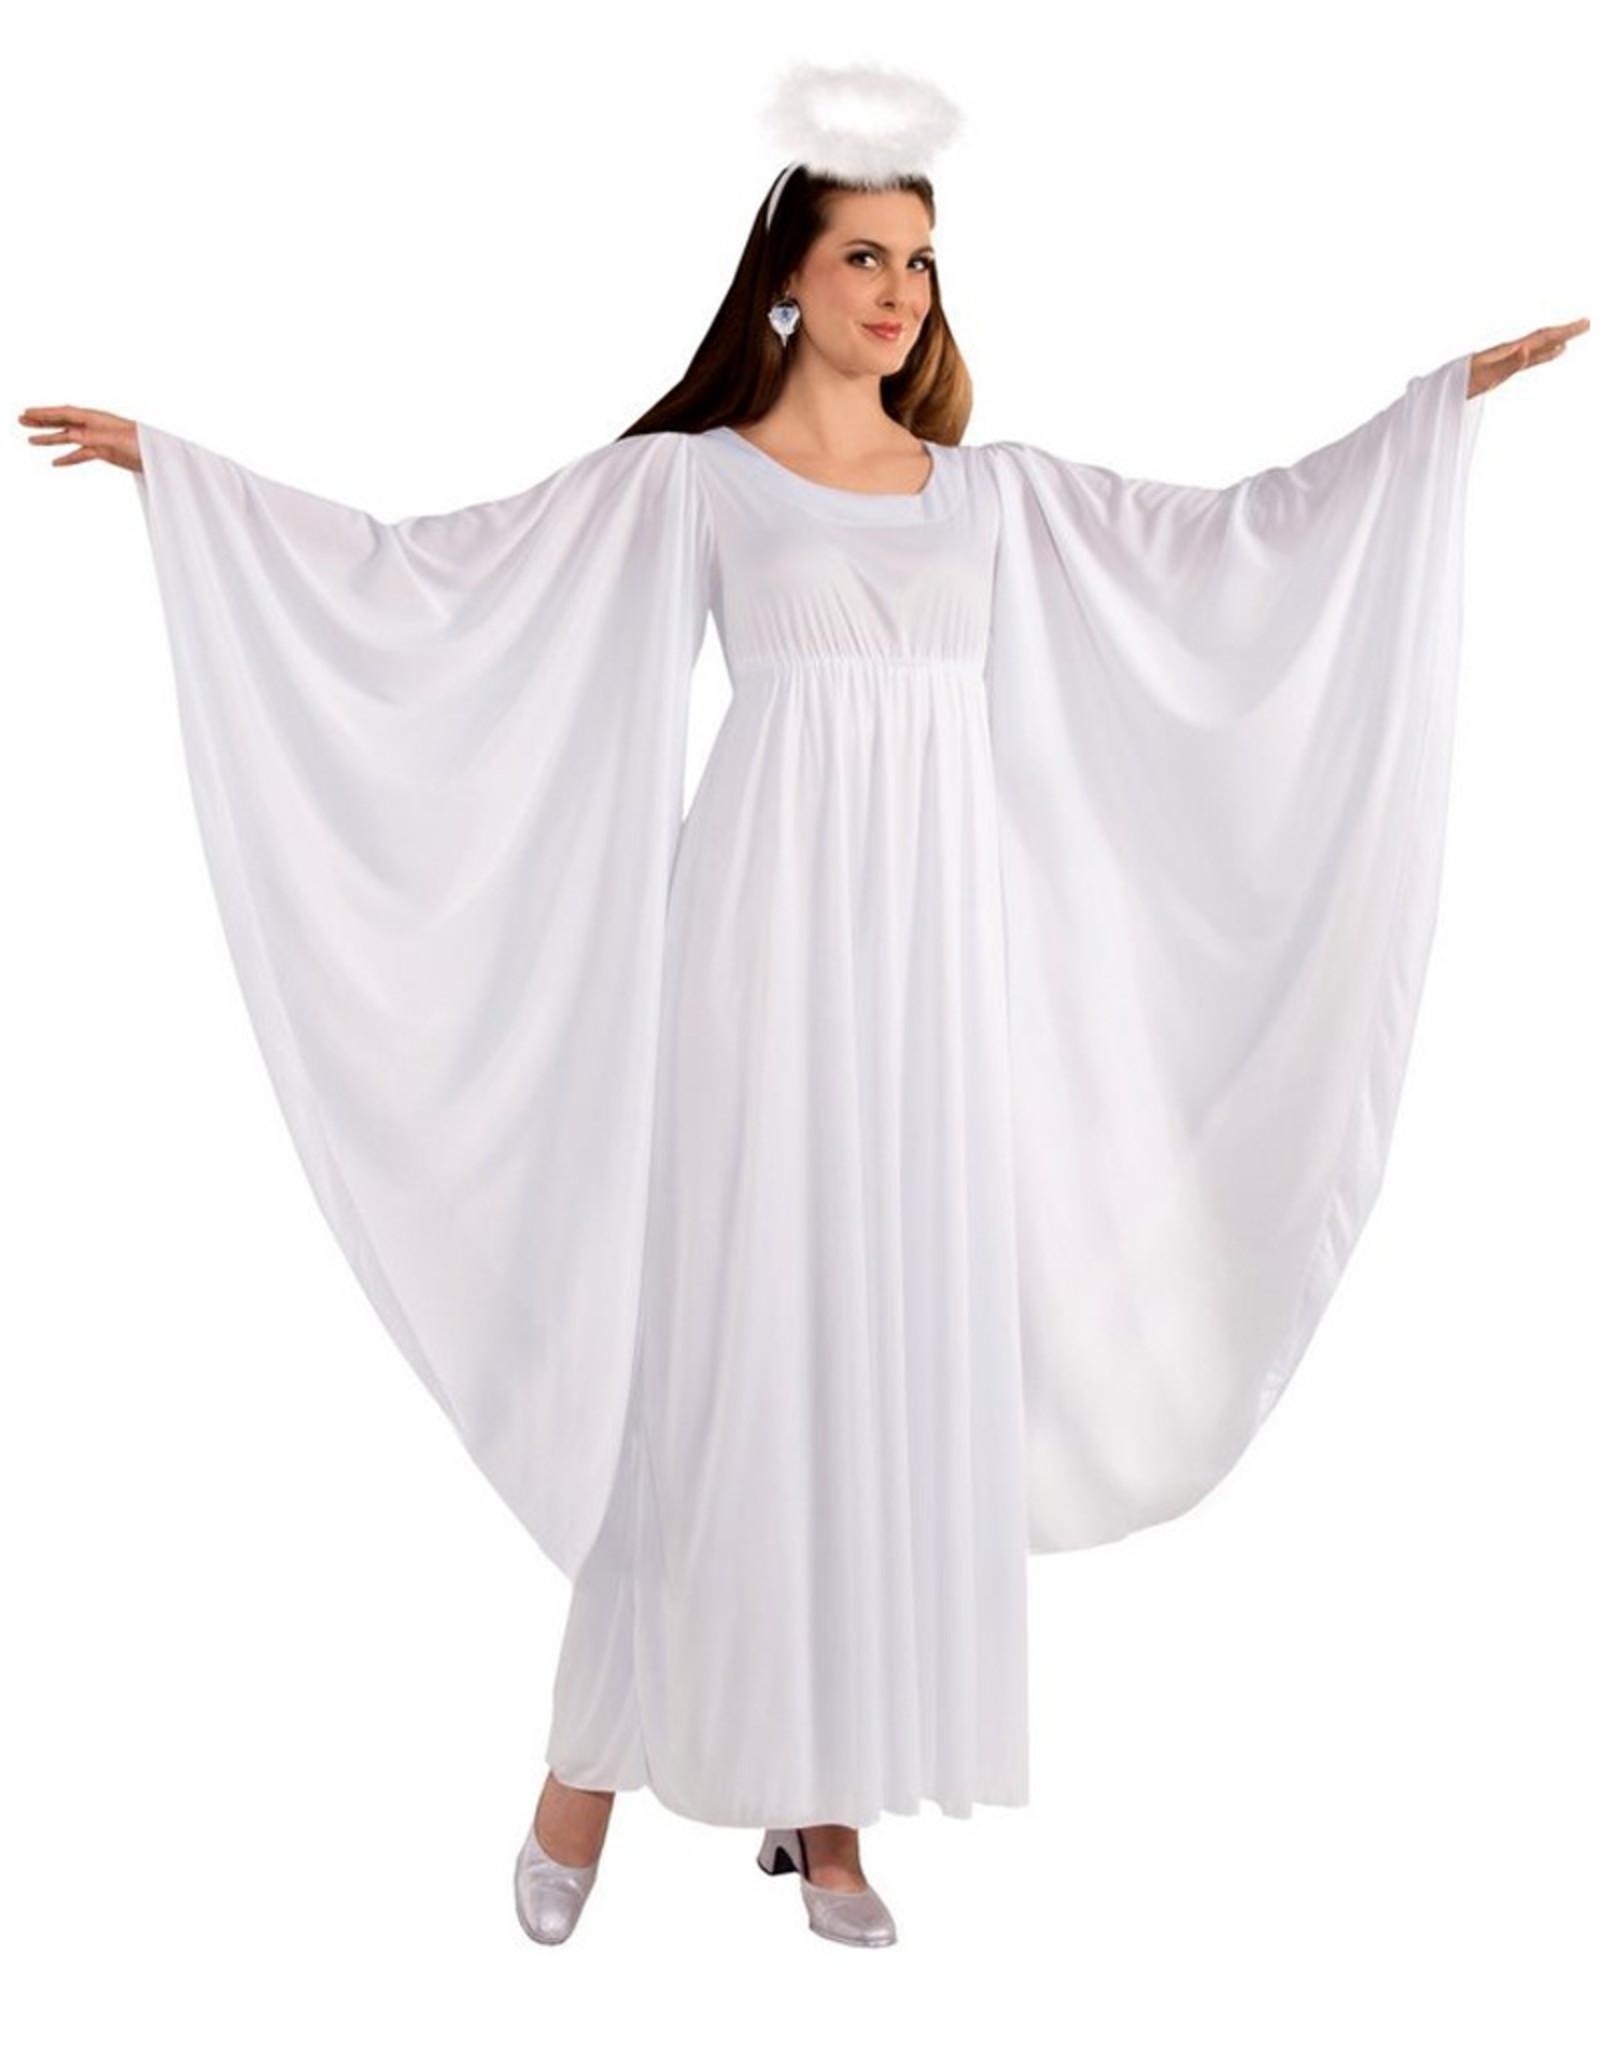 Angel Costume - Women's